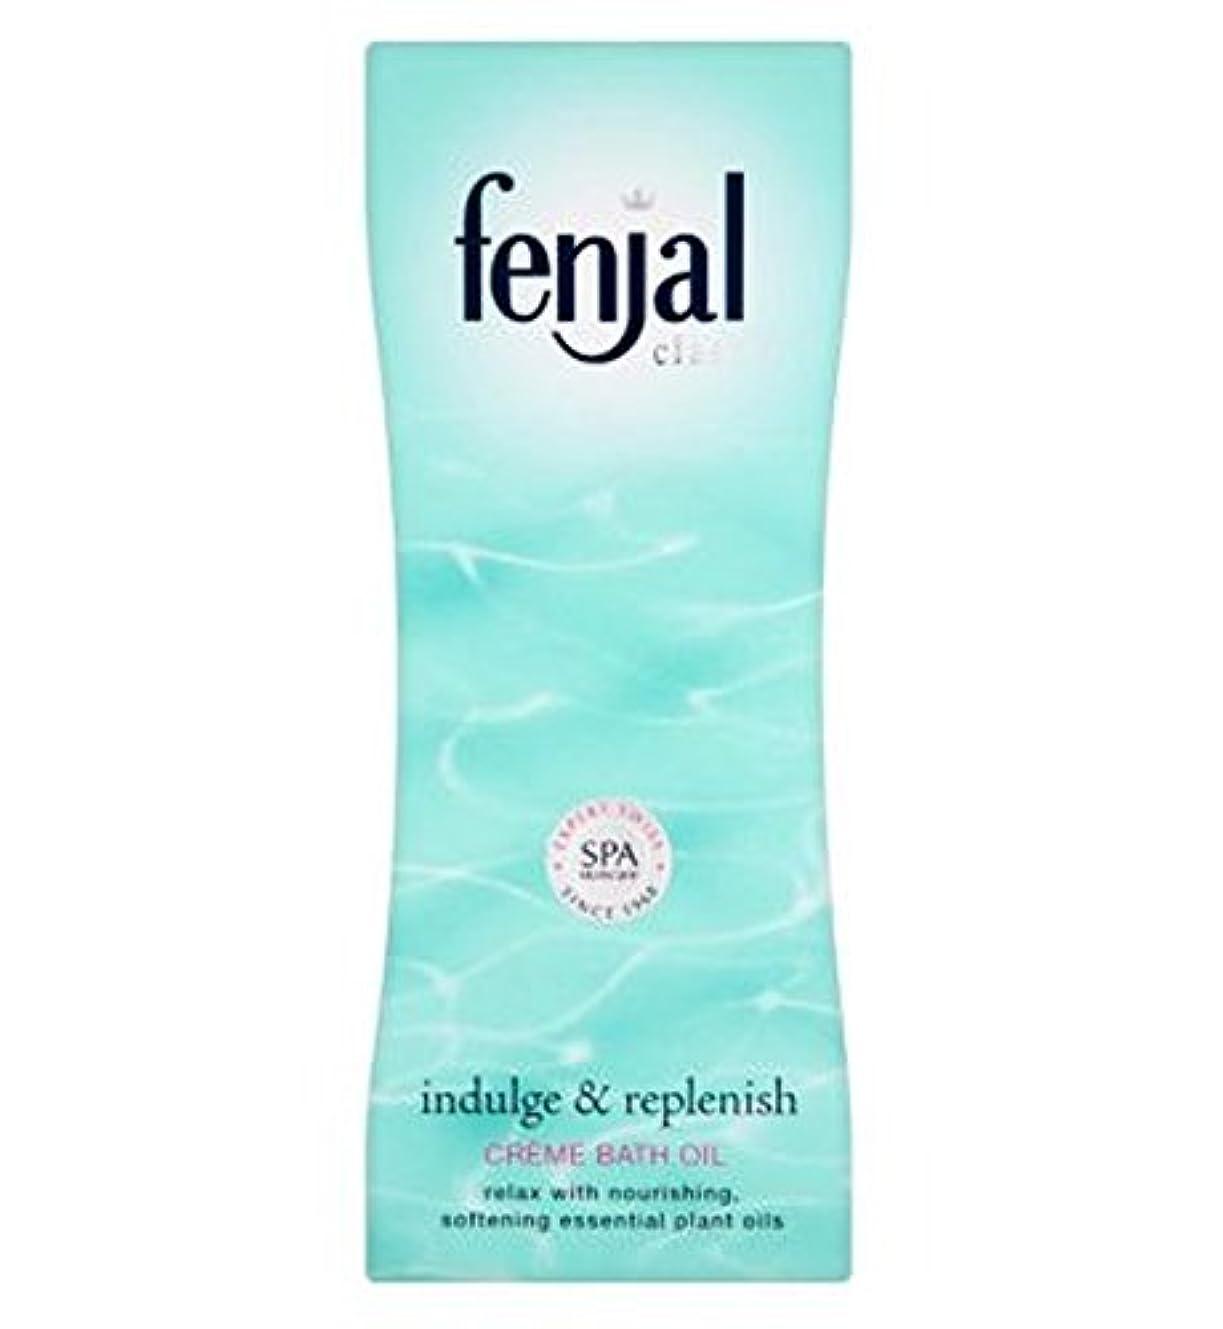 Fenjal古典的な高級クリームバスオイル (Fenjal) (x2) - Fenjal Classic Luxury Creme Bath Oil (Pack of 2) [並行輸入品]